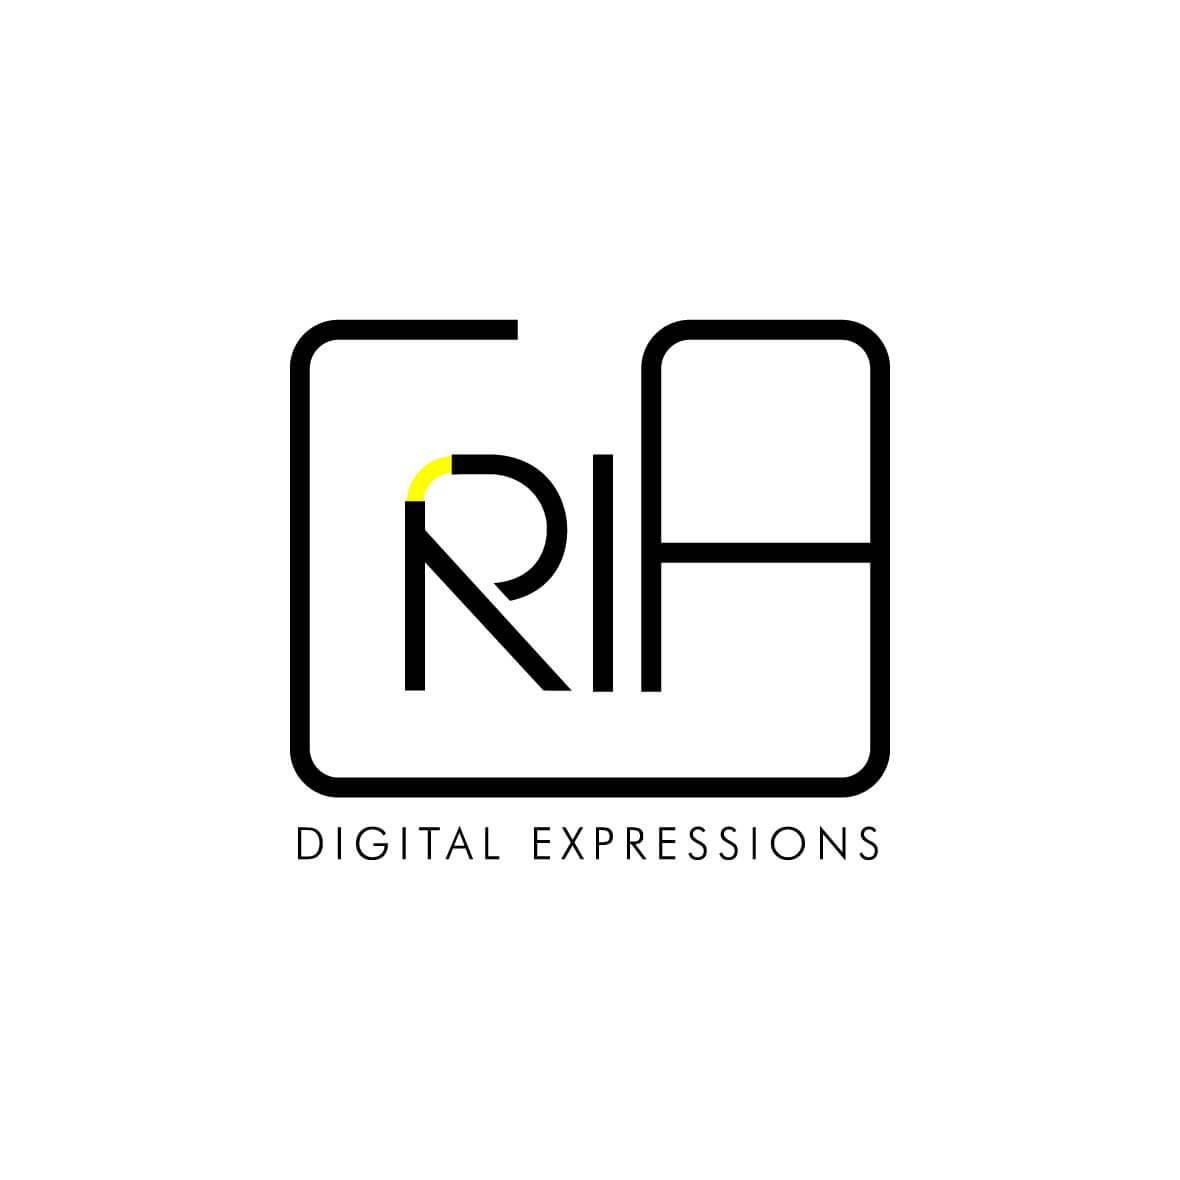 CRIA Digital Expressions